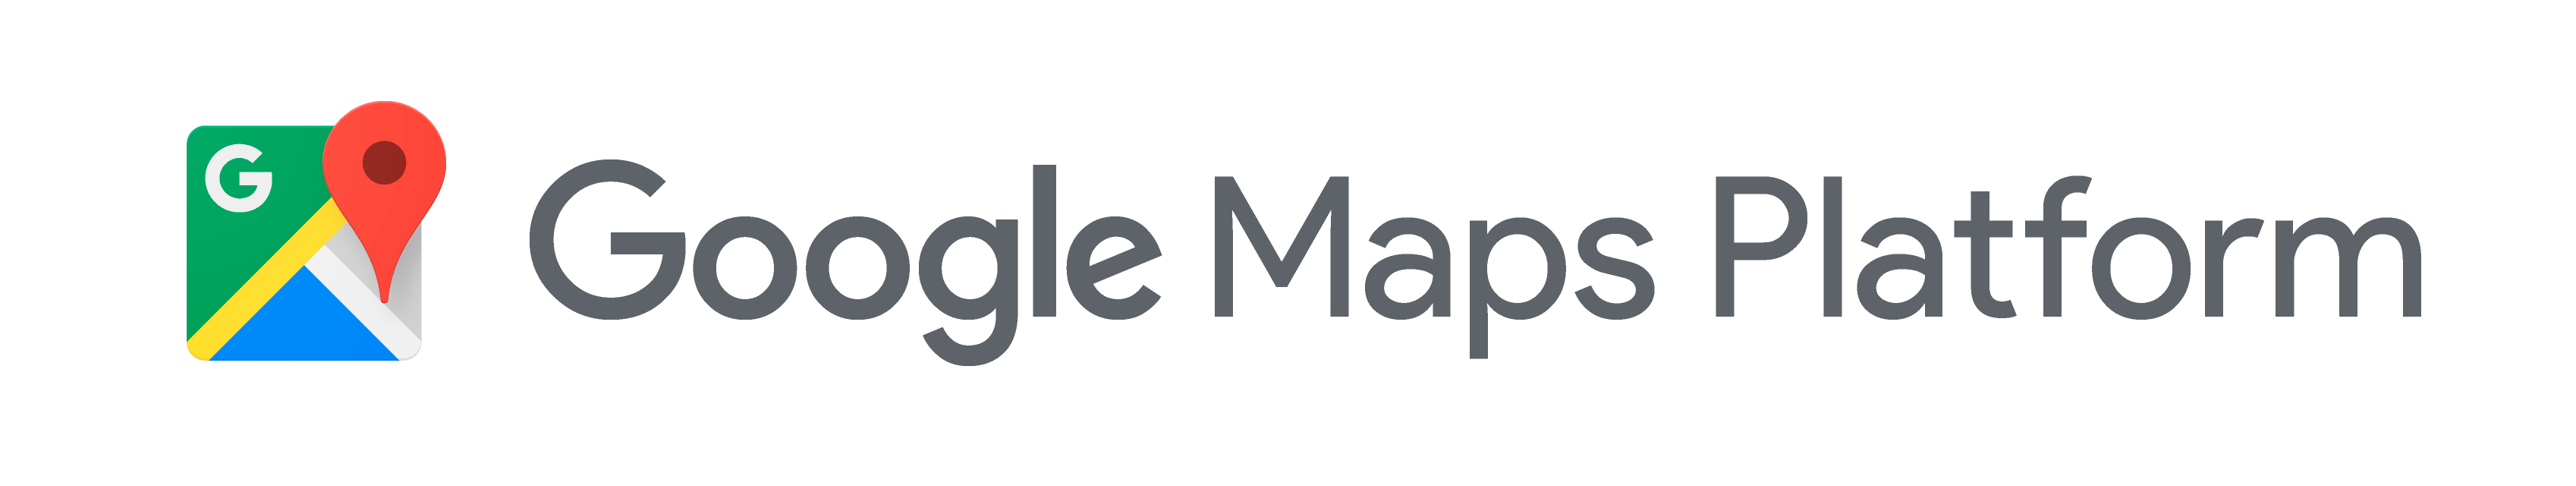 google_maps_platform